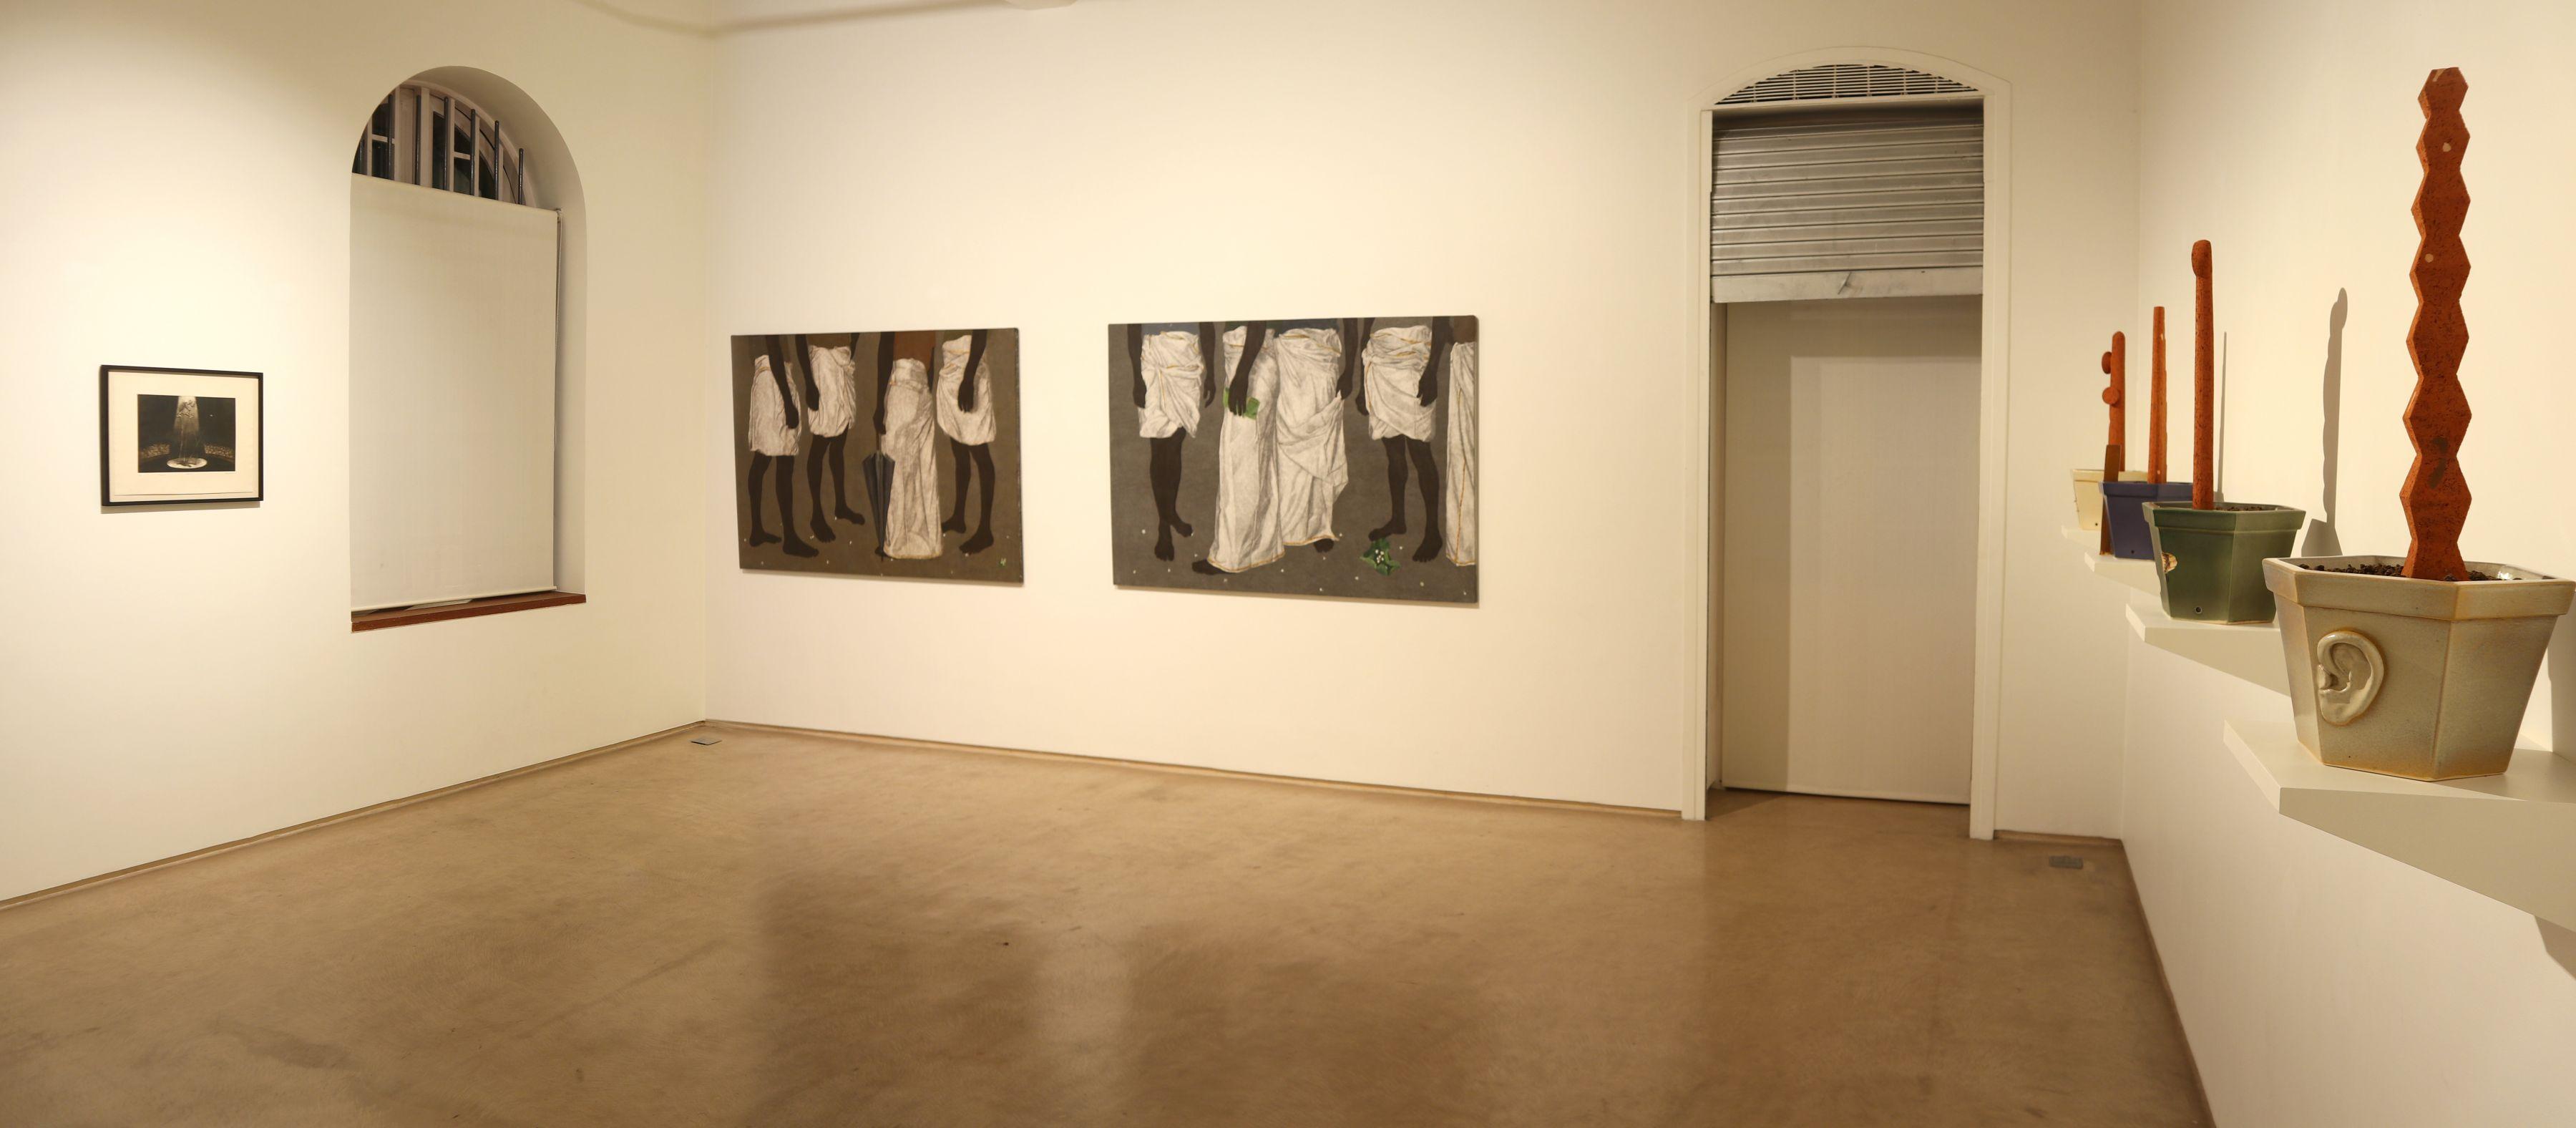 Installation View (Gallery1)